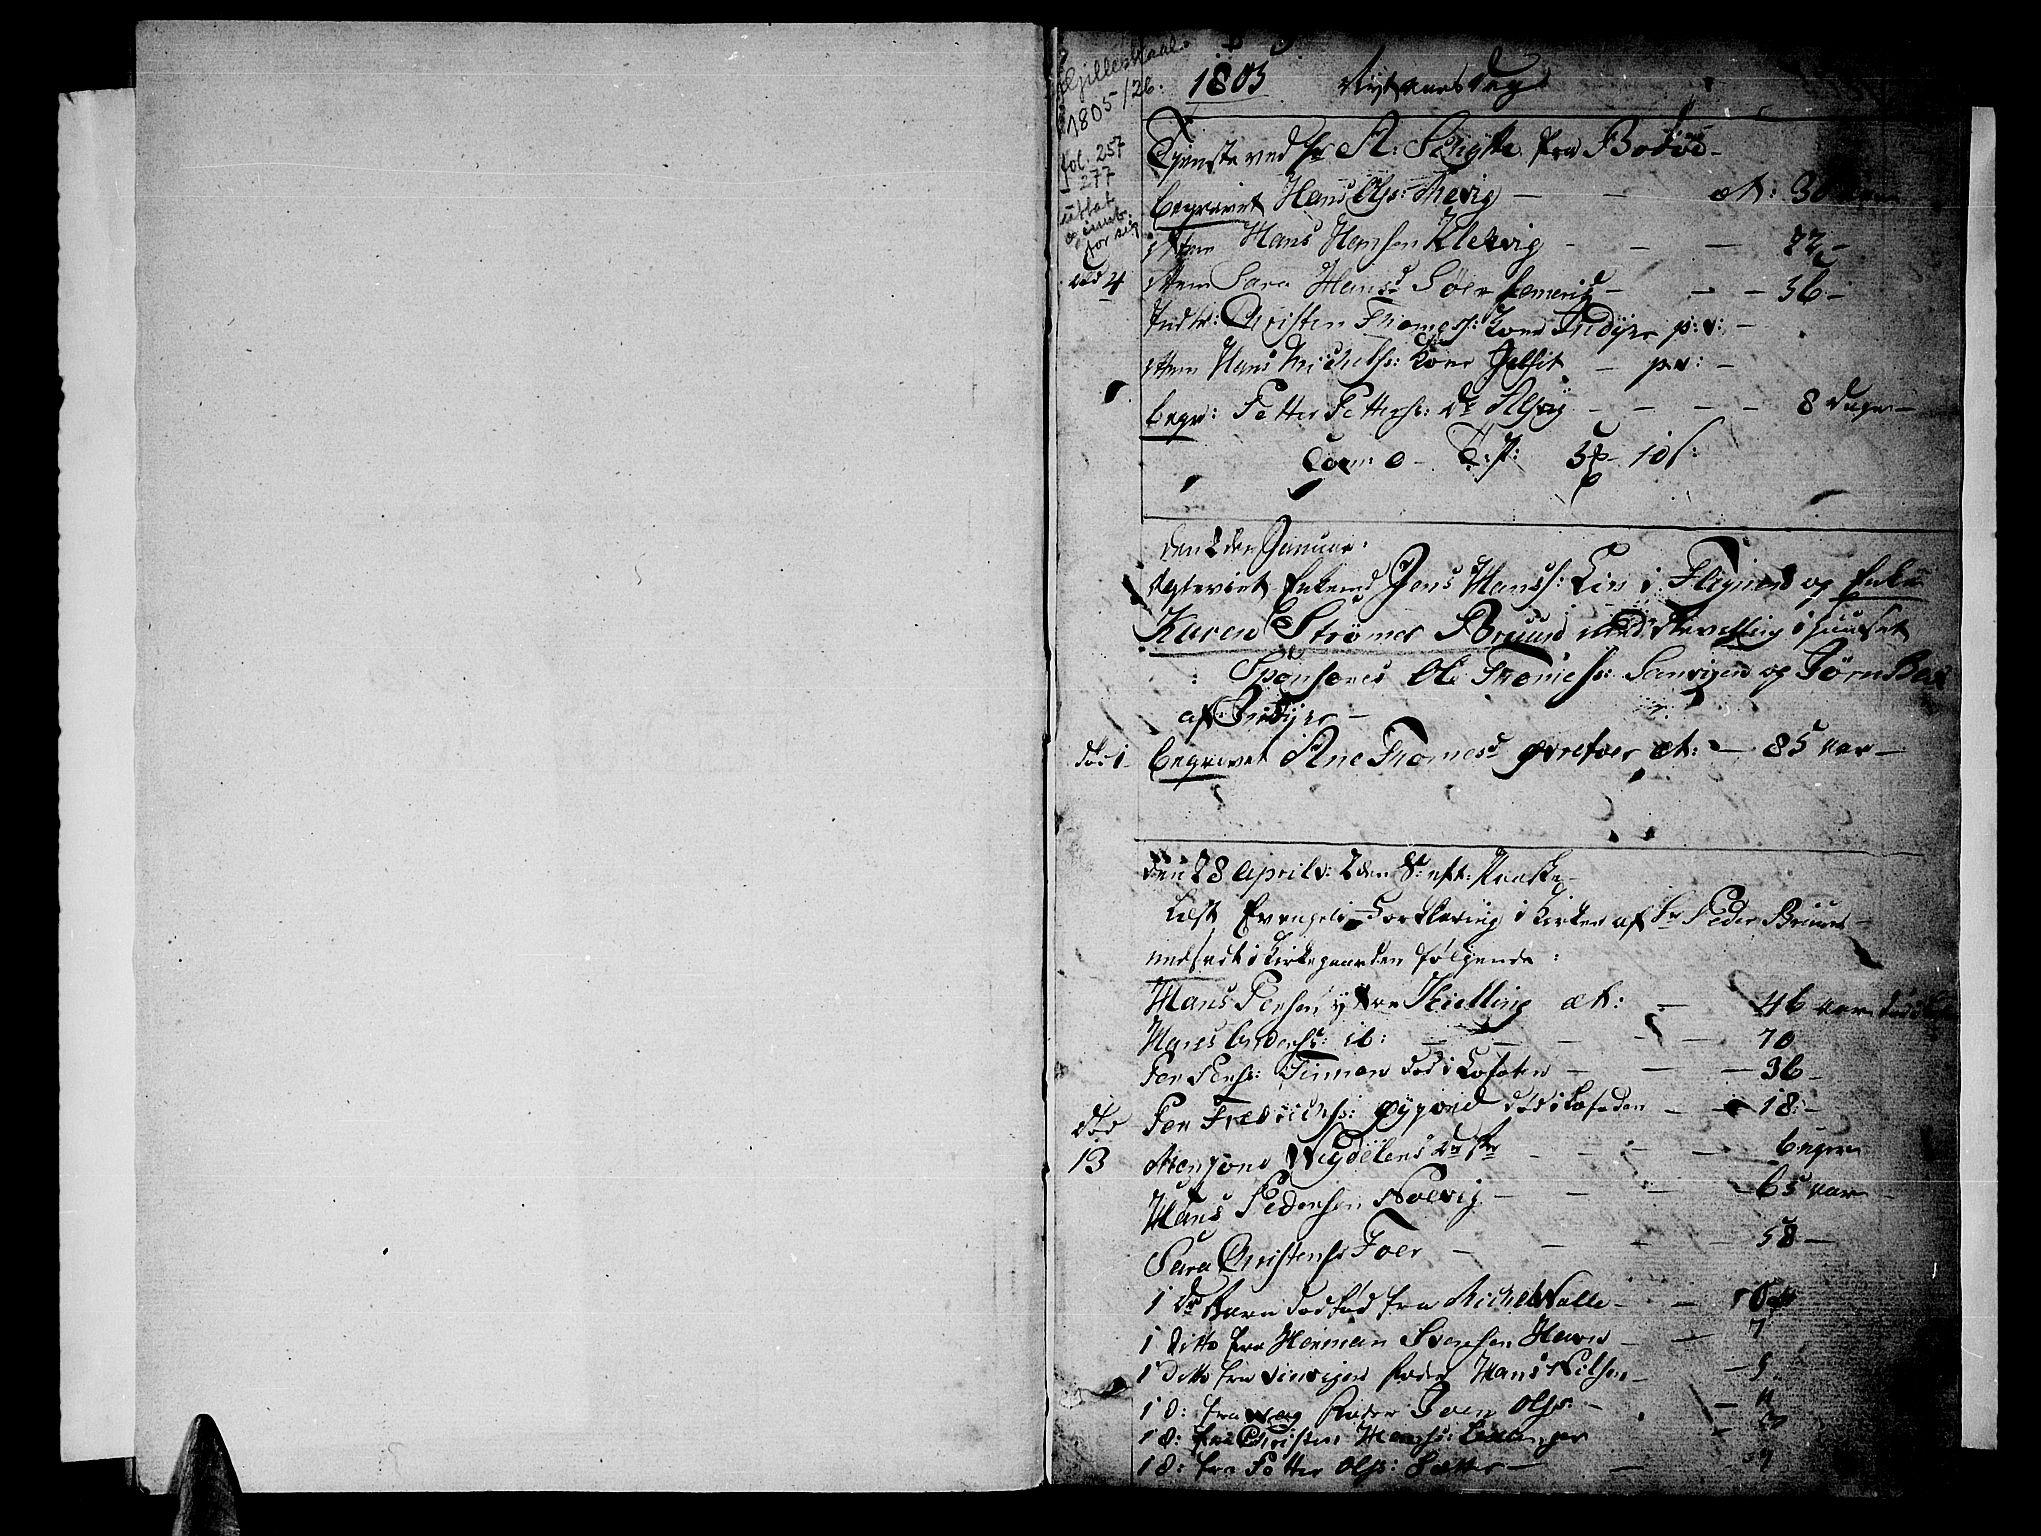 SAT, Ministerialprotokoller, klokkerbøker og fødselsregistre - Nordland, 805/L0095: Ministerialbok nr. 805A02, 1805-1826, s. 1